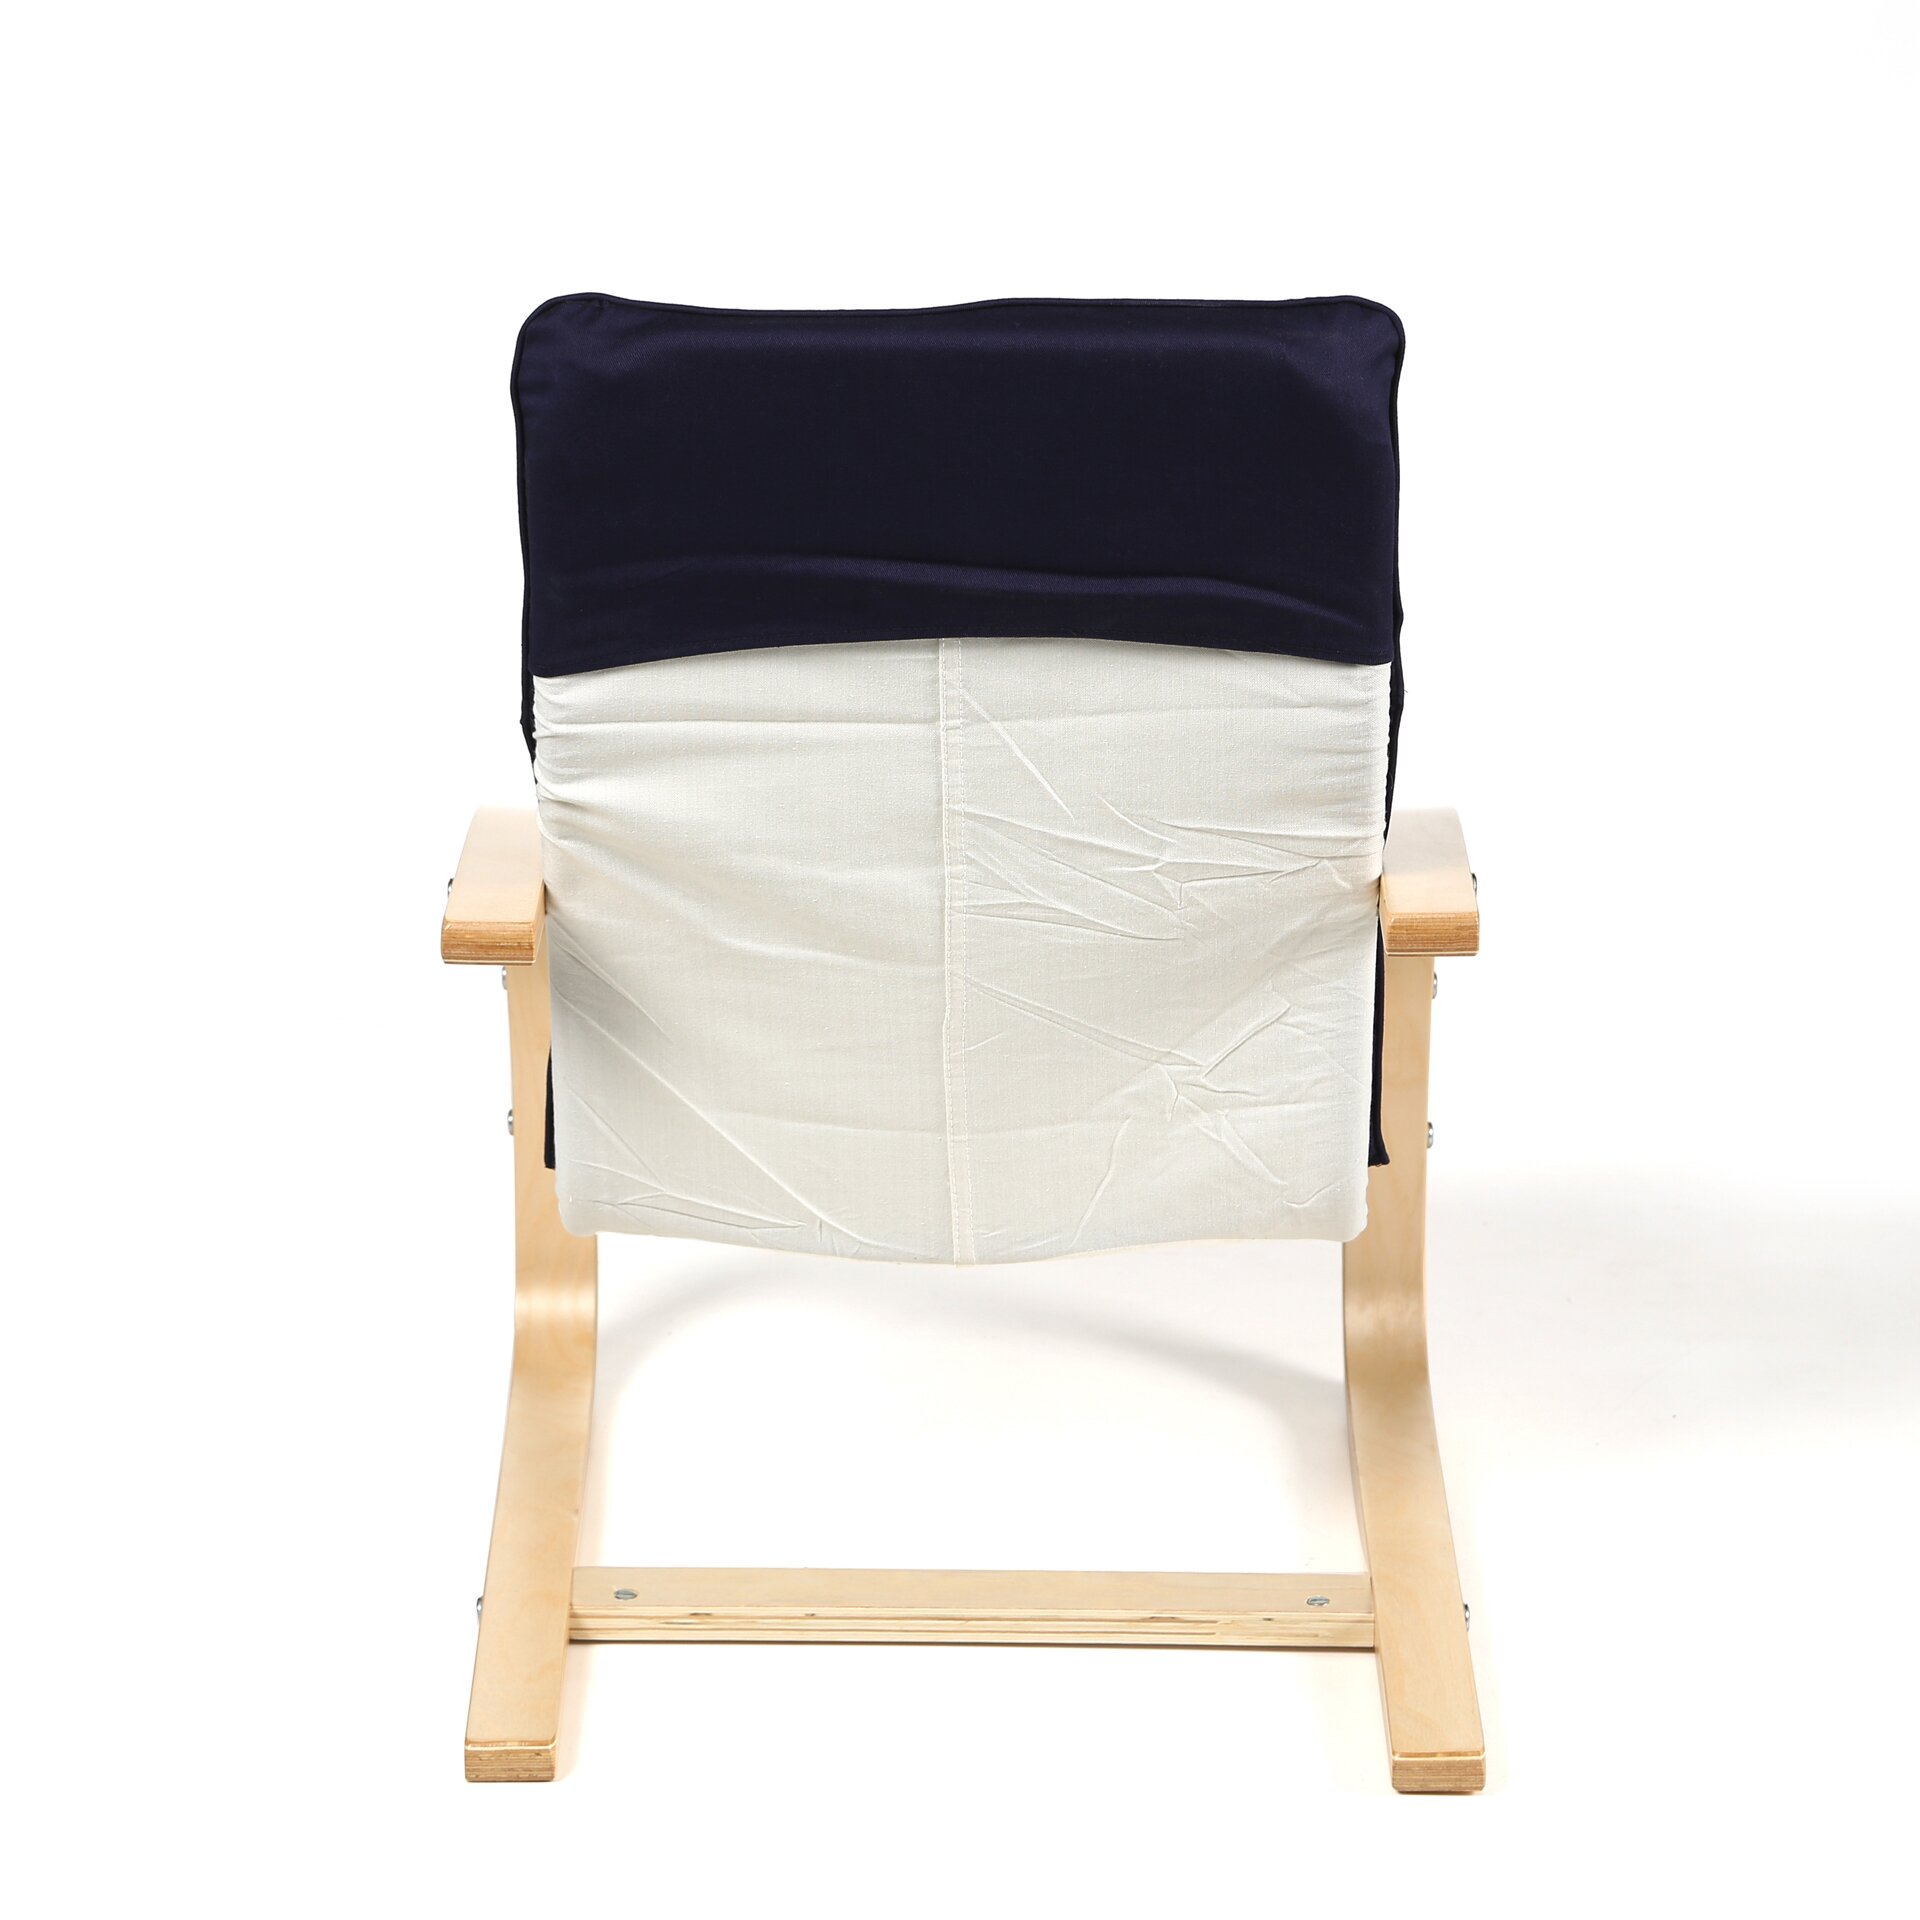 Guidecraft Kiddie Rocker Chair Amp Reviews Wayfair